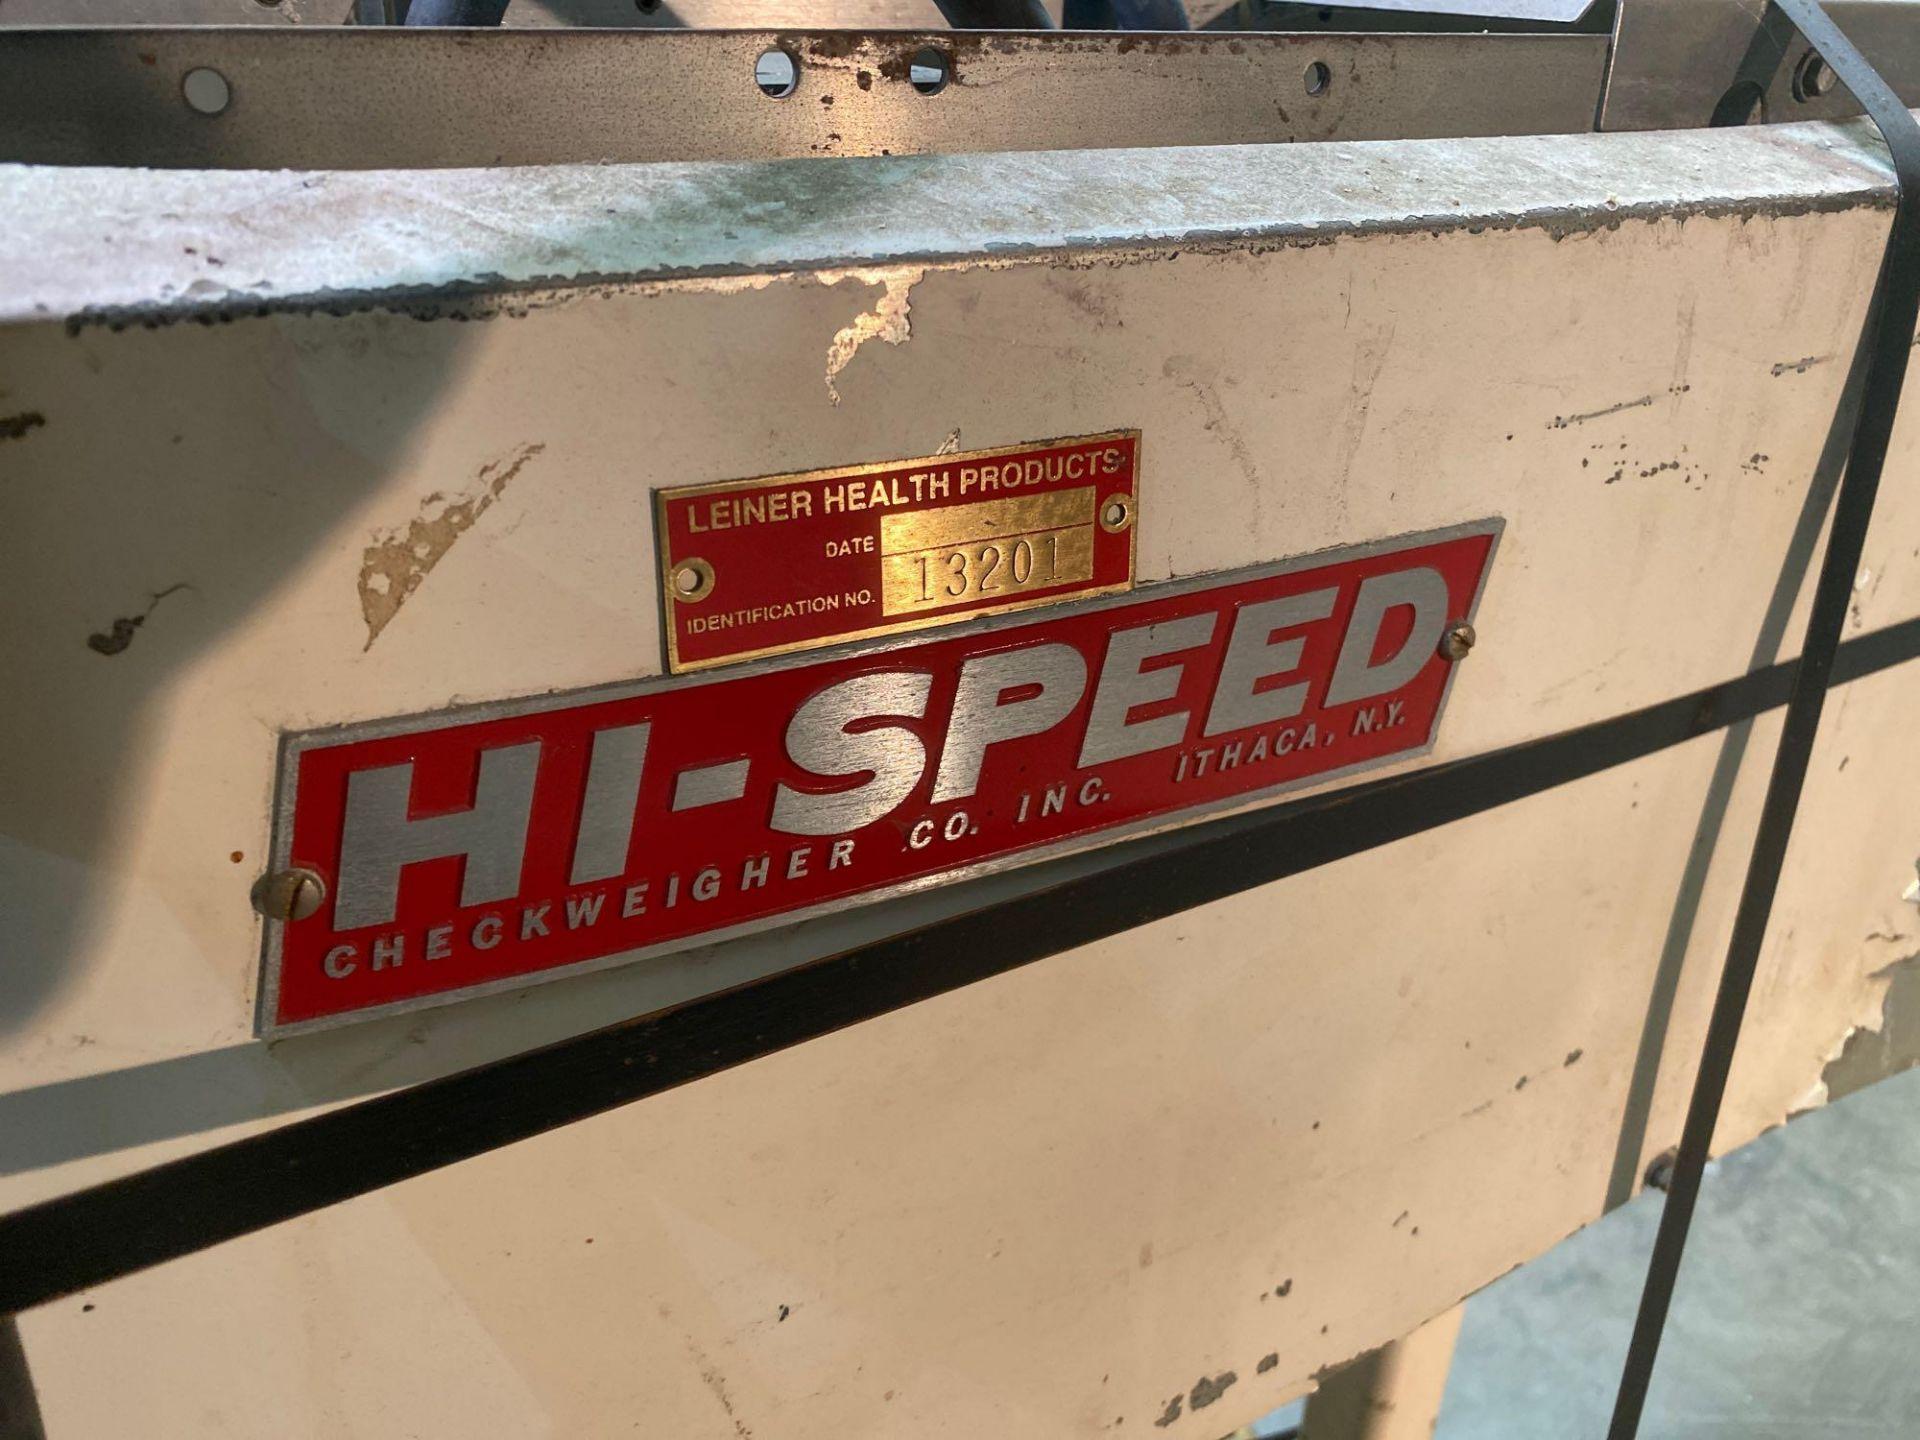 High Speed Micro Mate Weightchecker - Image 4 of 10